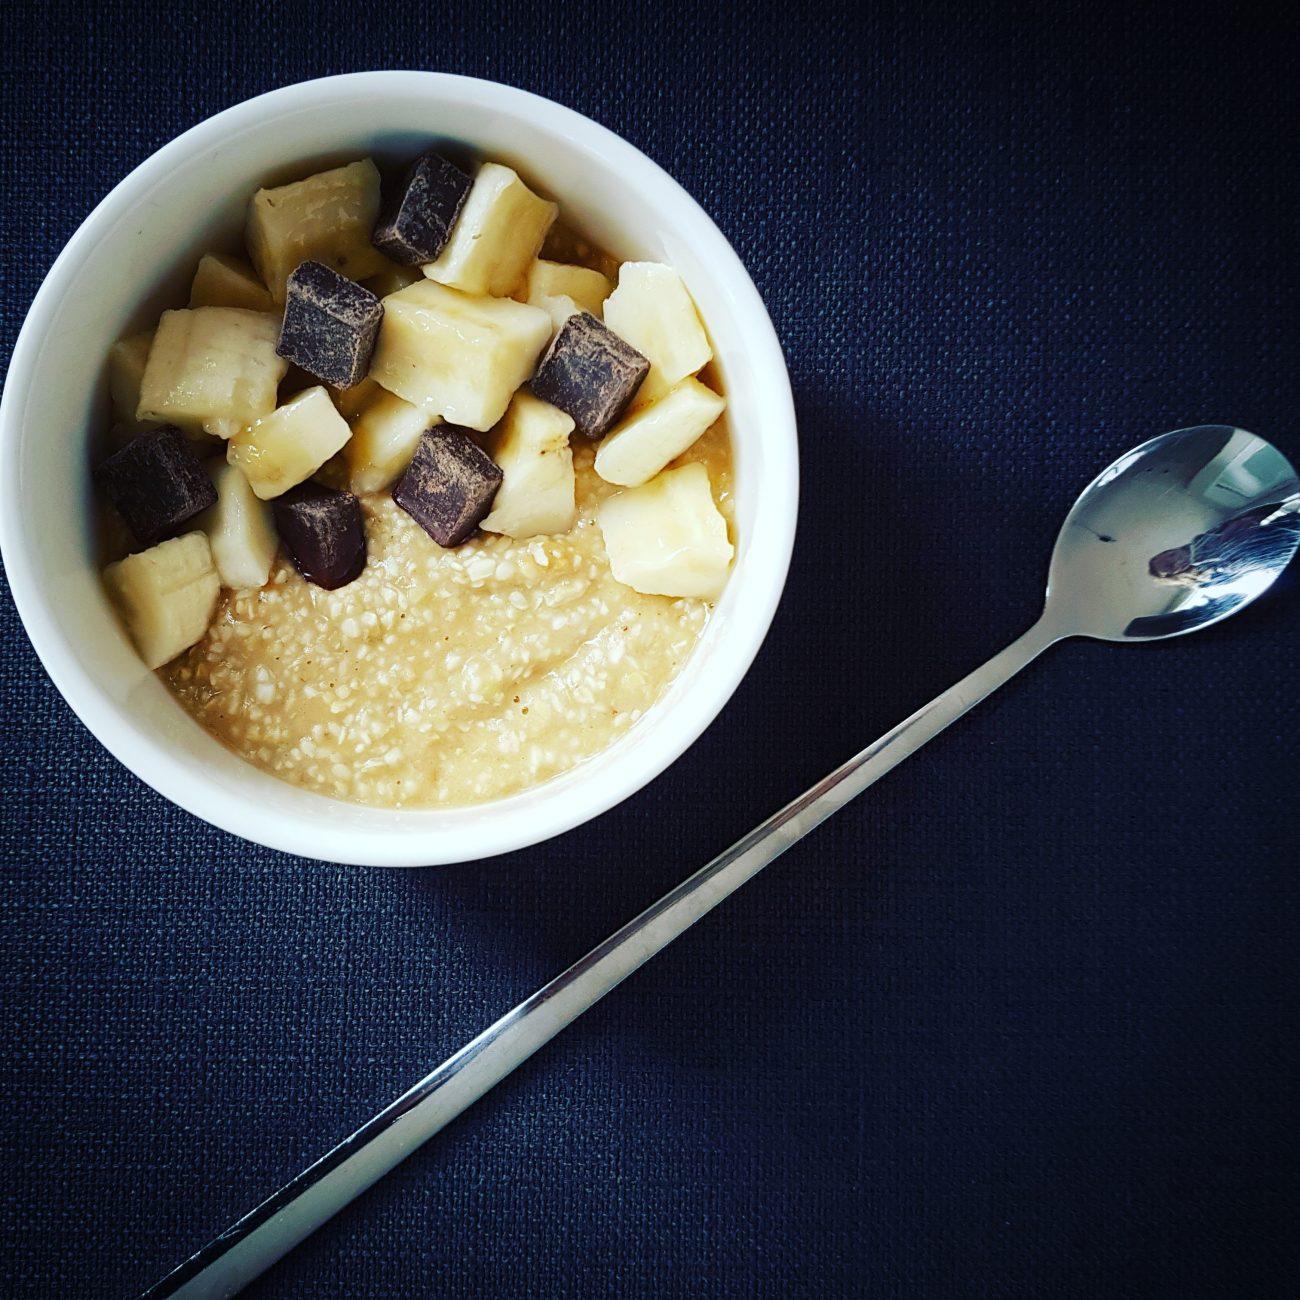 Banana, chocolate and peanut buckwheat porridge